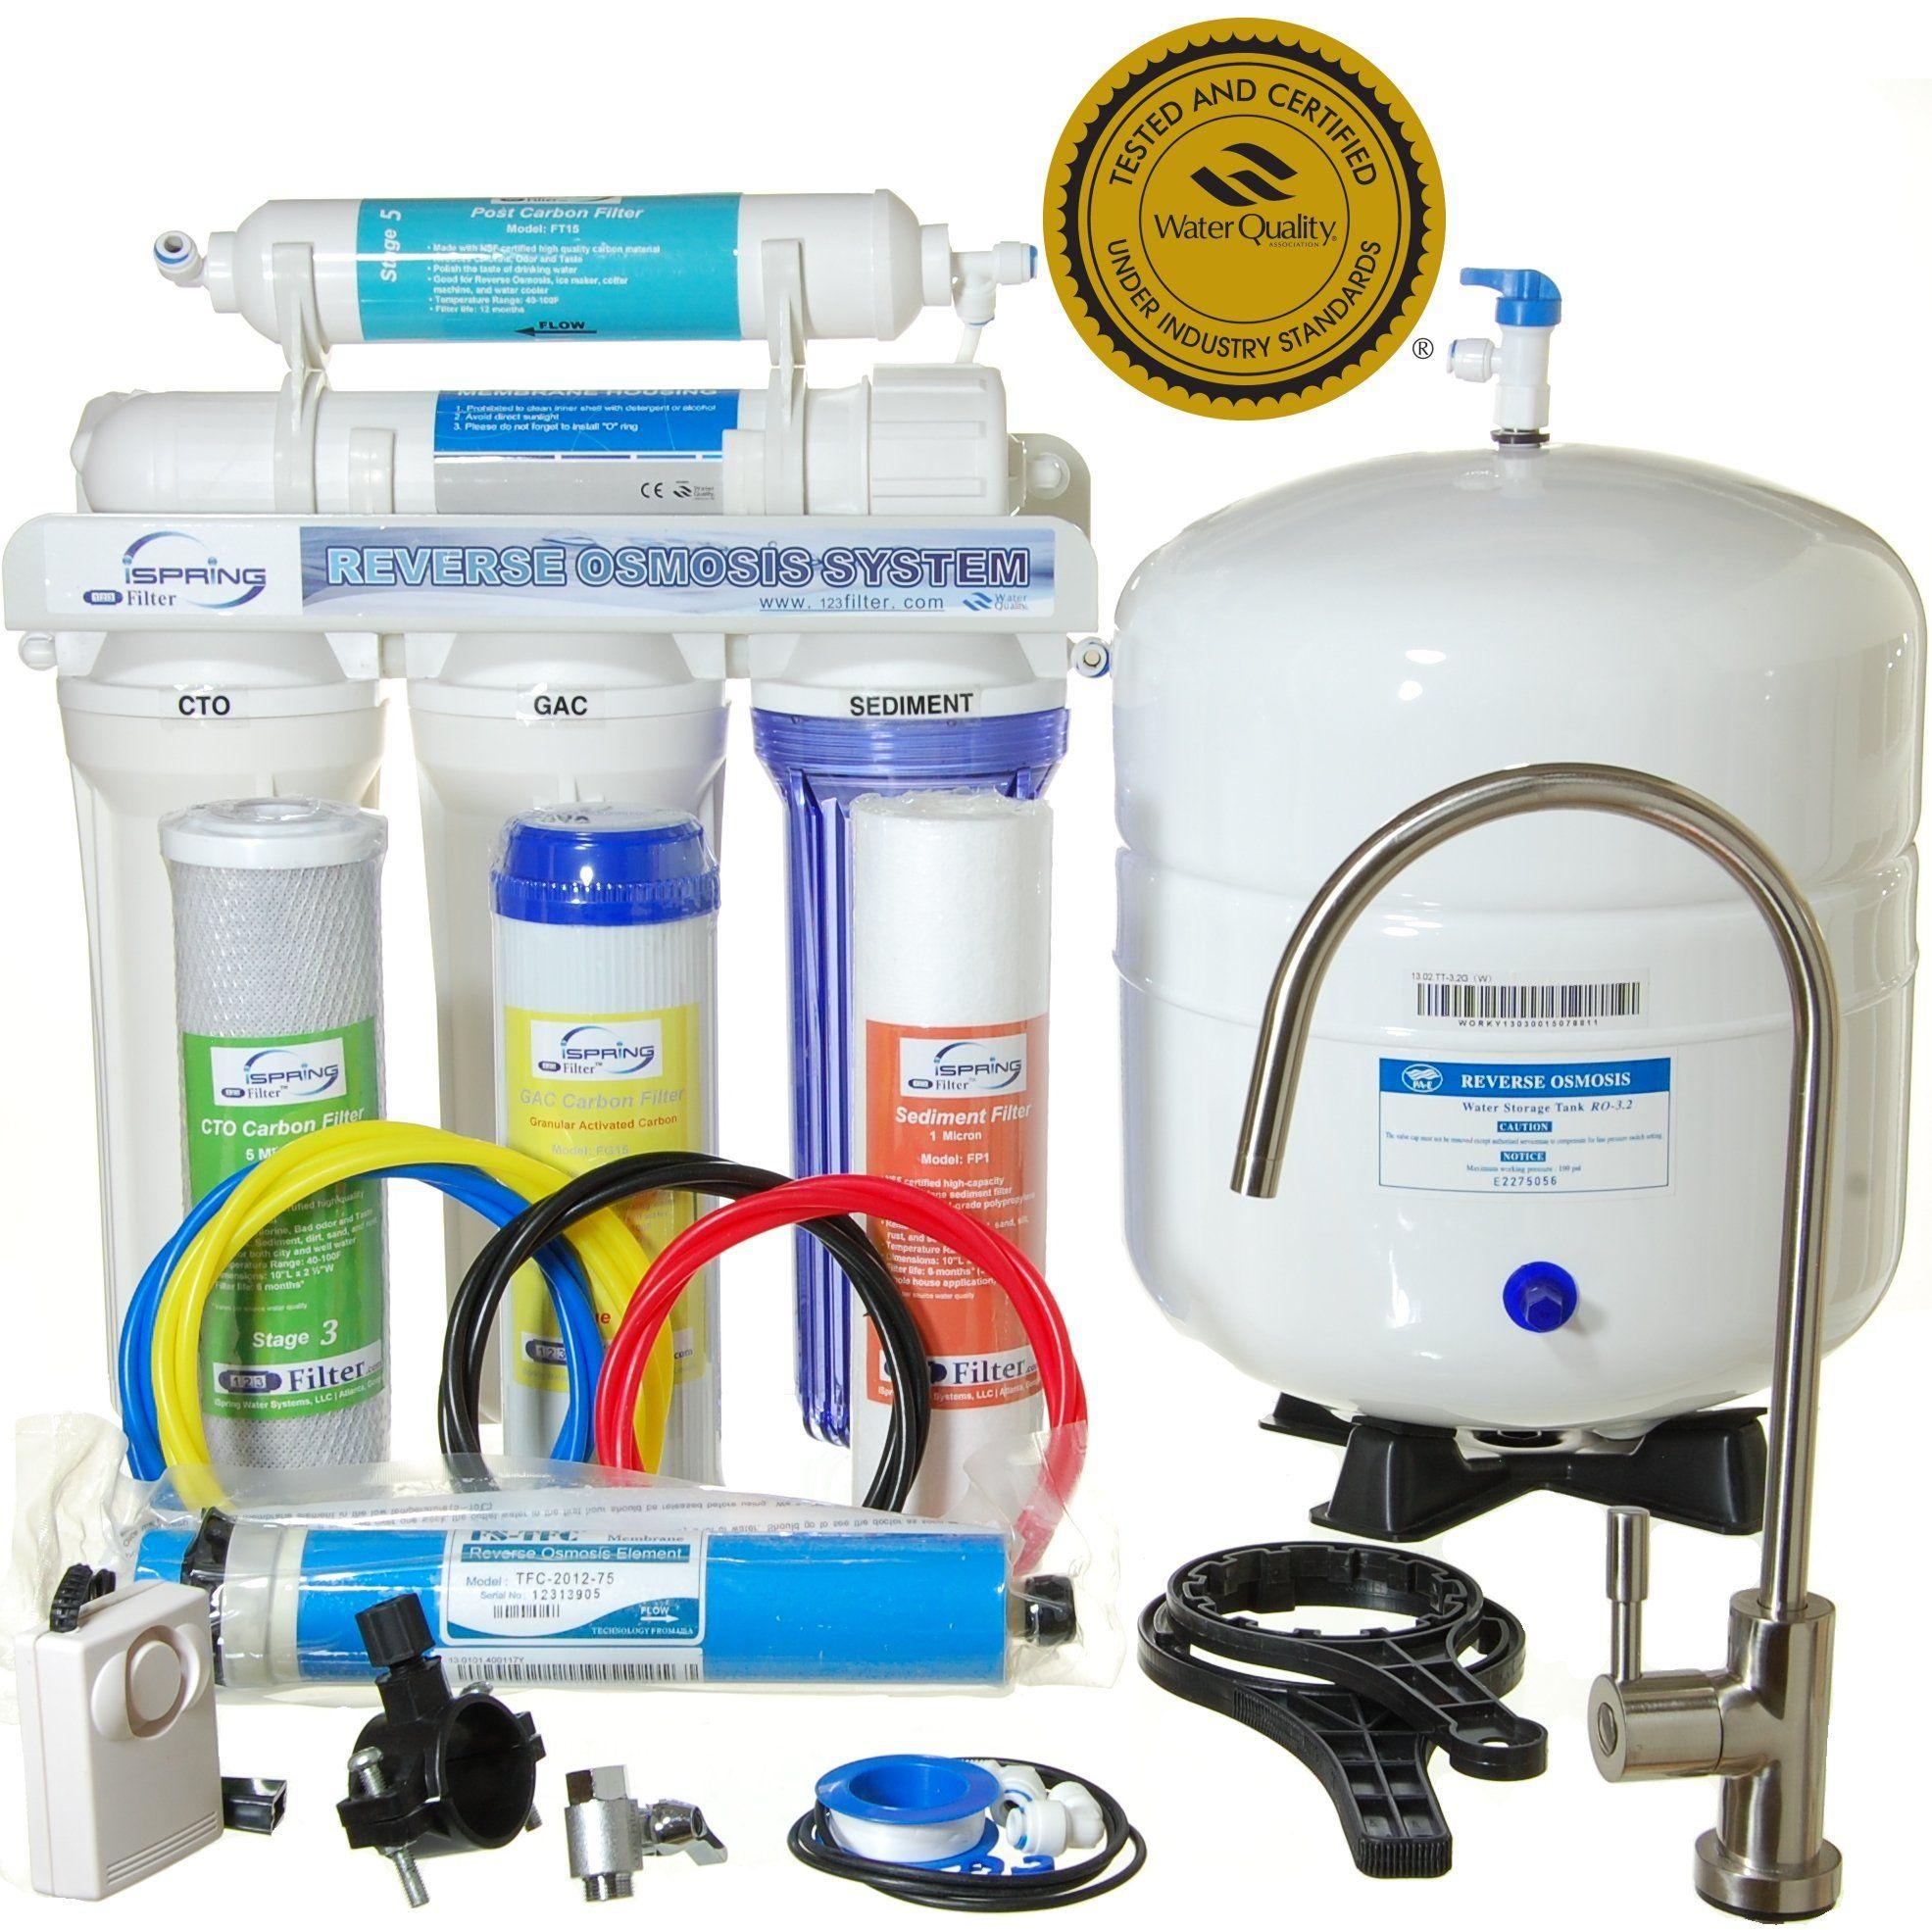 7f5726bf4d9e8f3e6cbeab4f816d85e4 - Application Of Reverse Osmosis Class 12